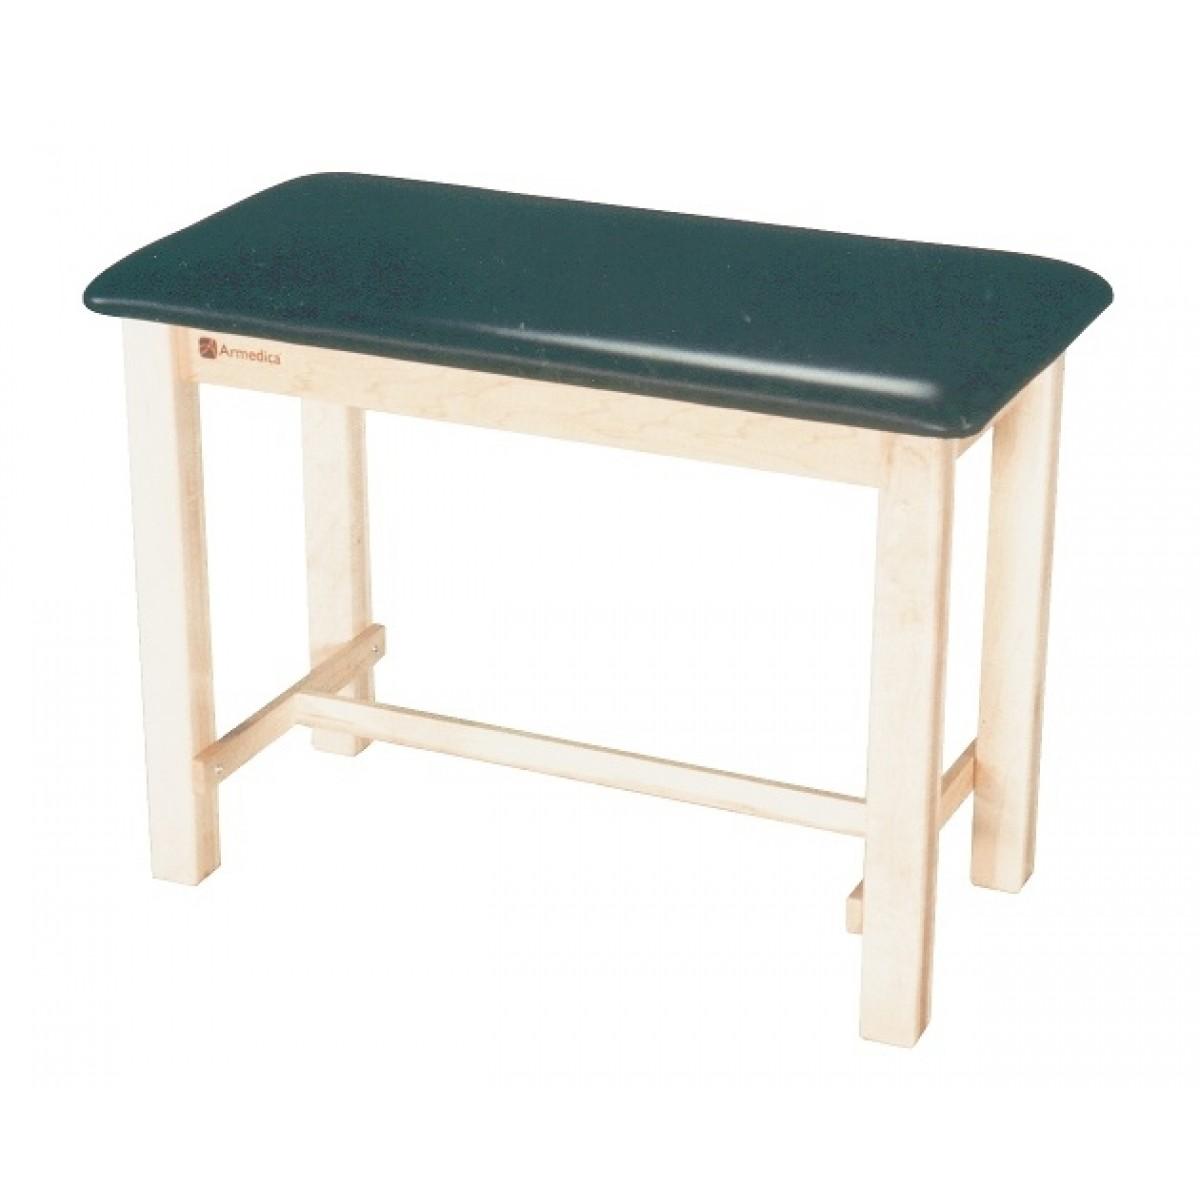 Armedica taping table